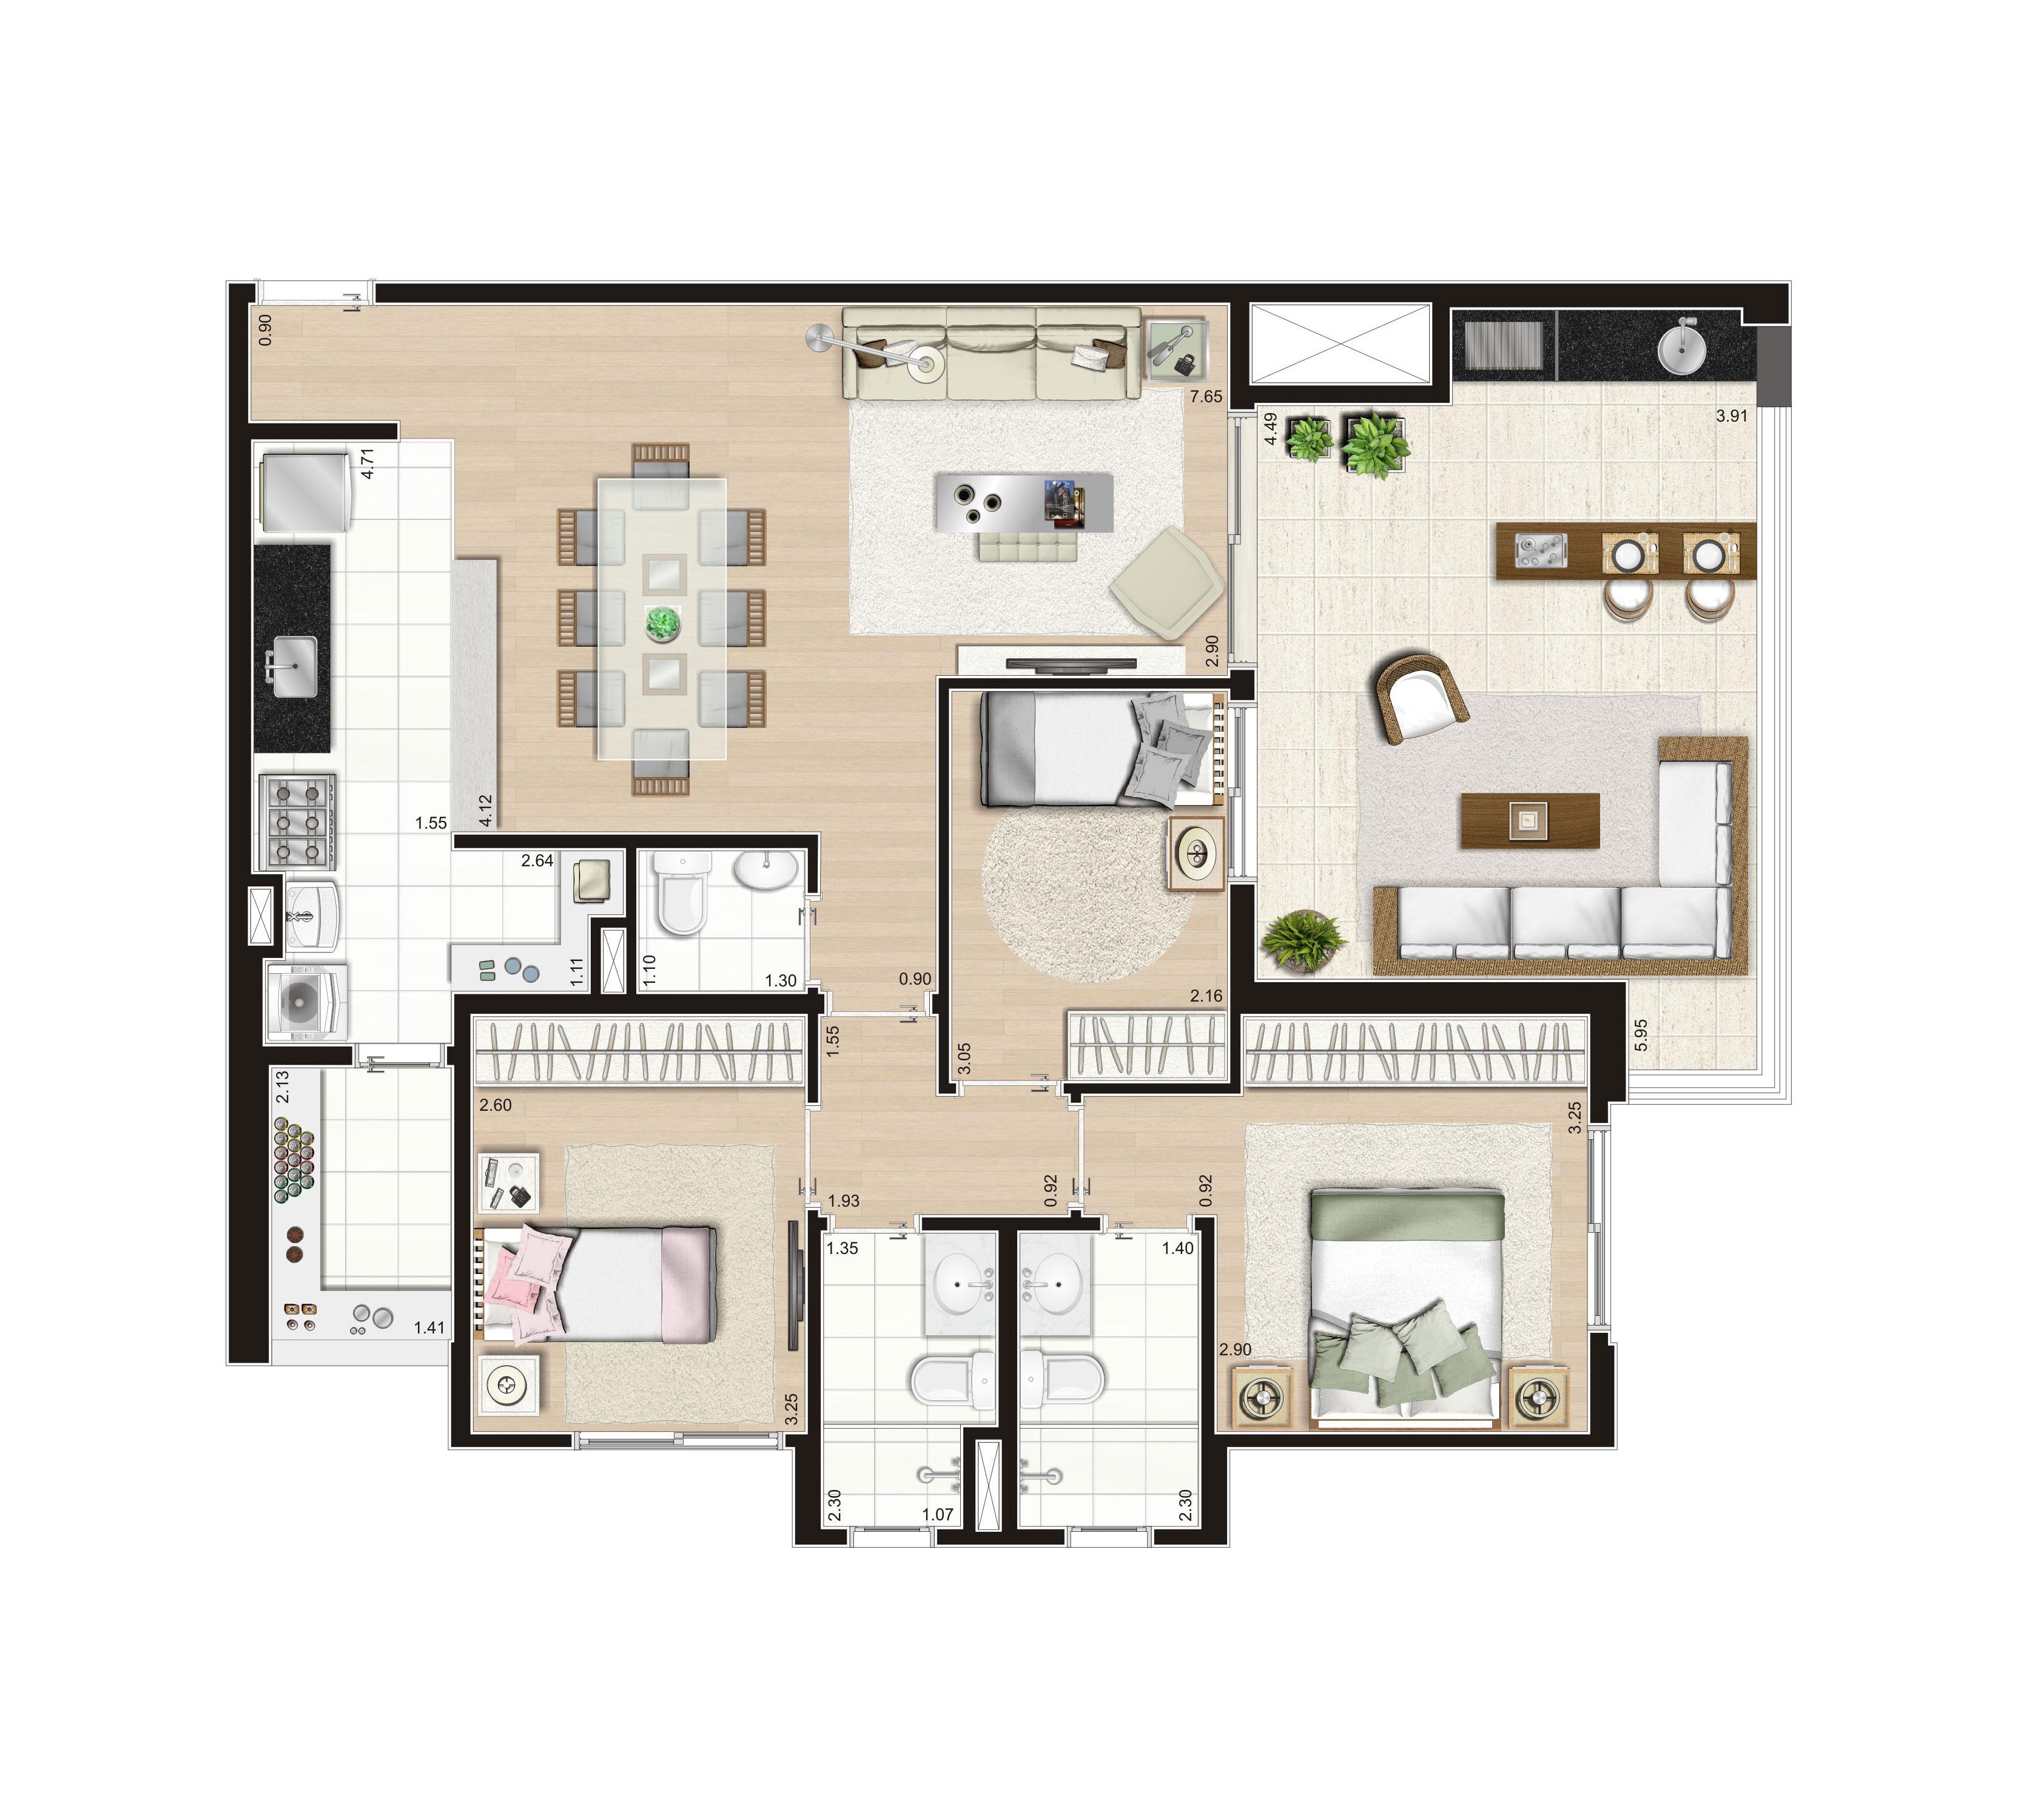 108 m² - 3 dorms